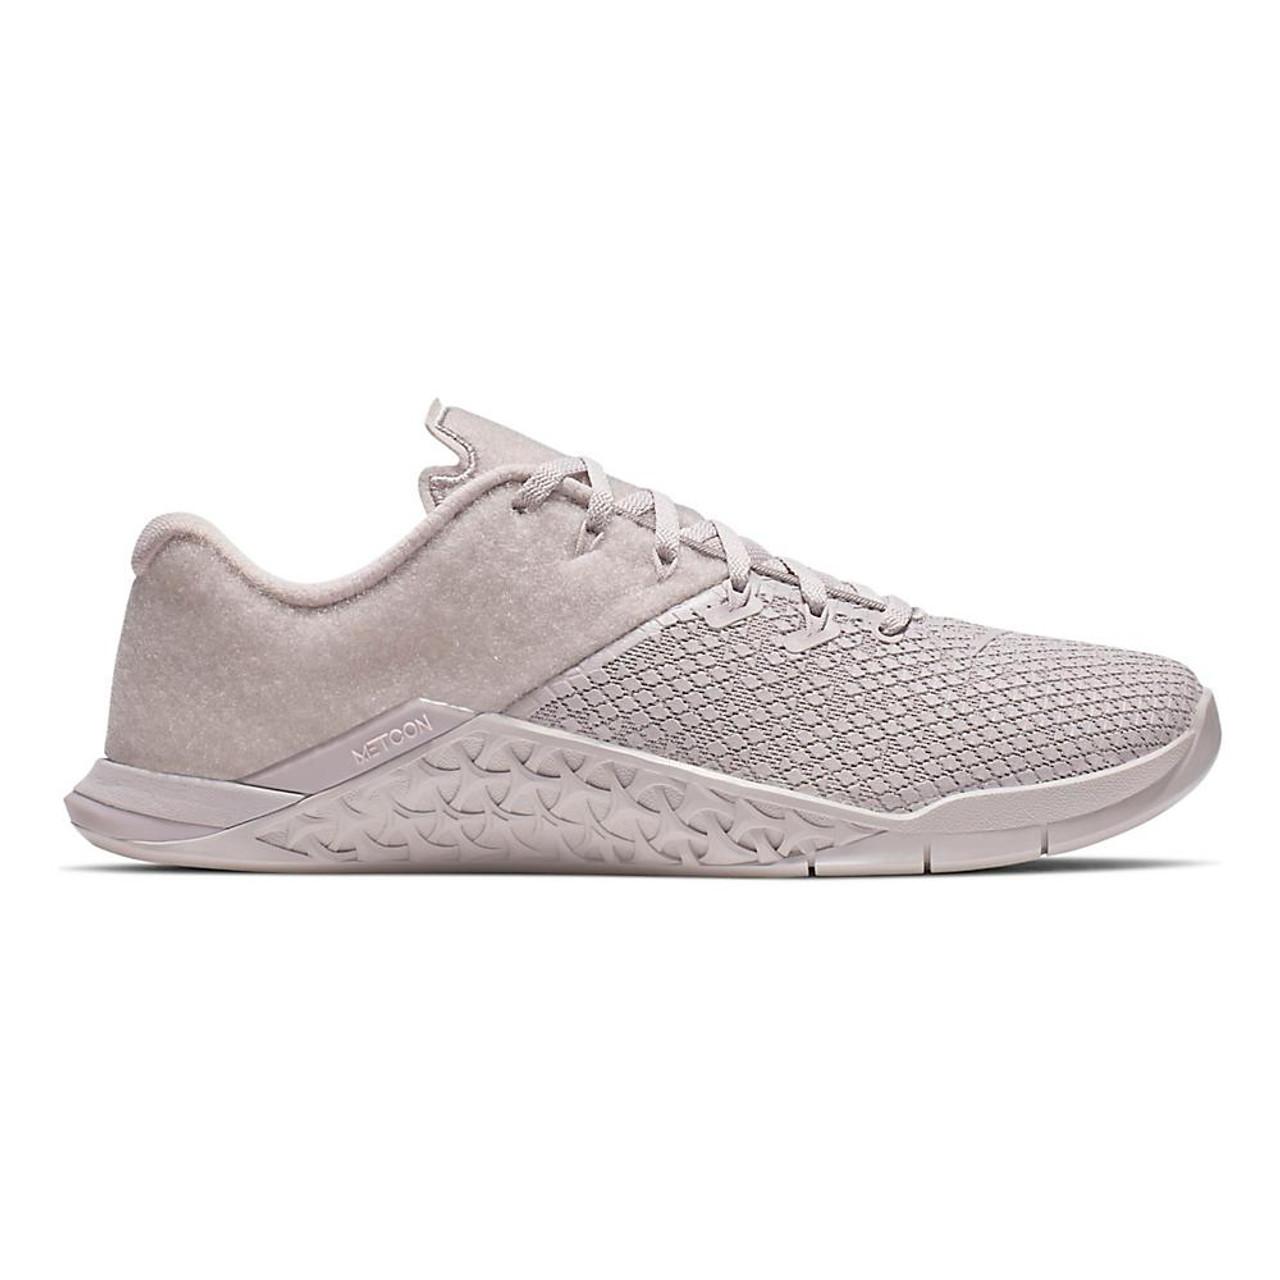 Women's Nike Metcon 4 XD Patch | Free